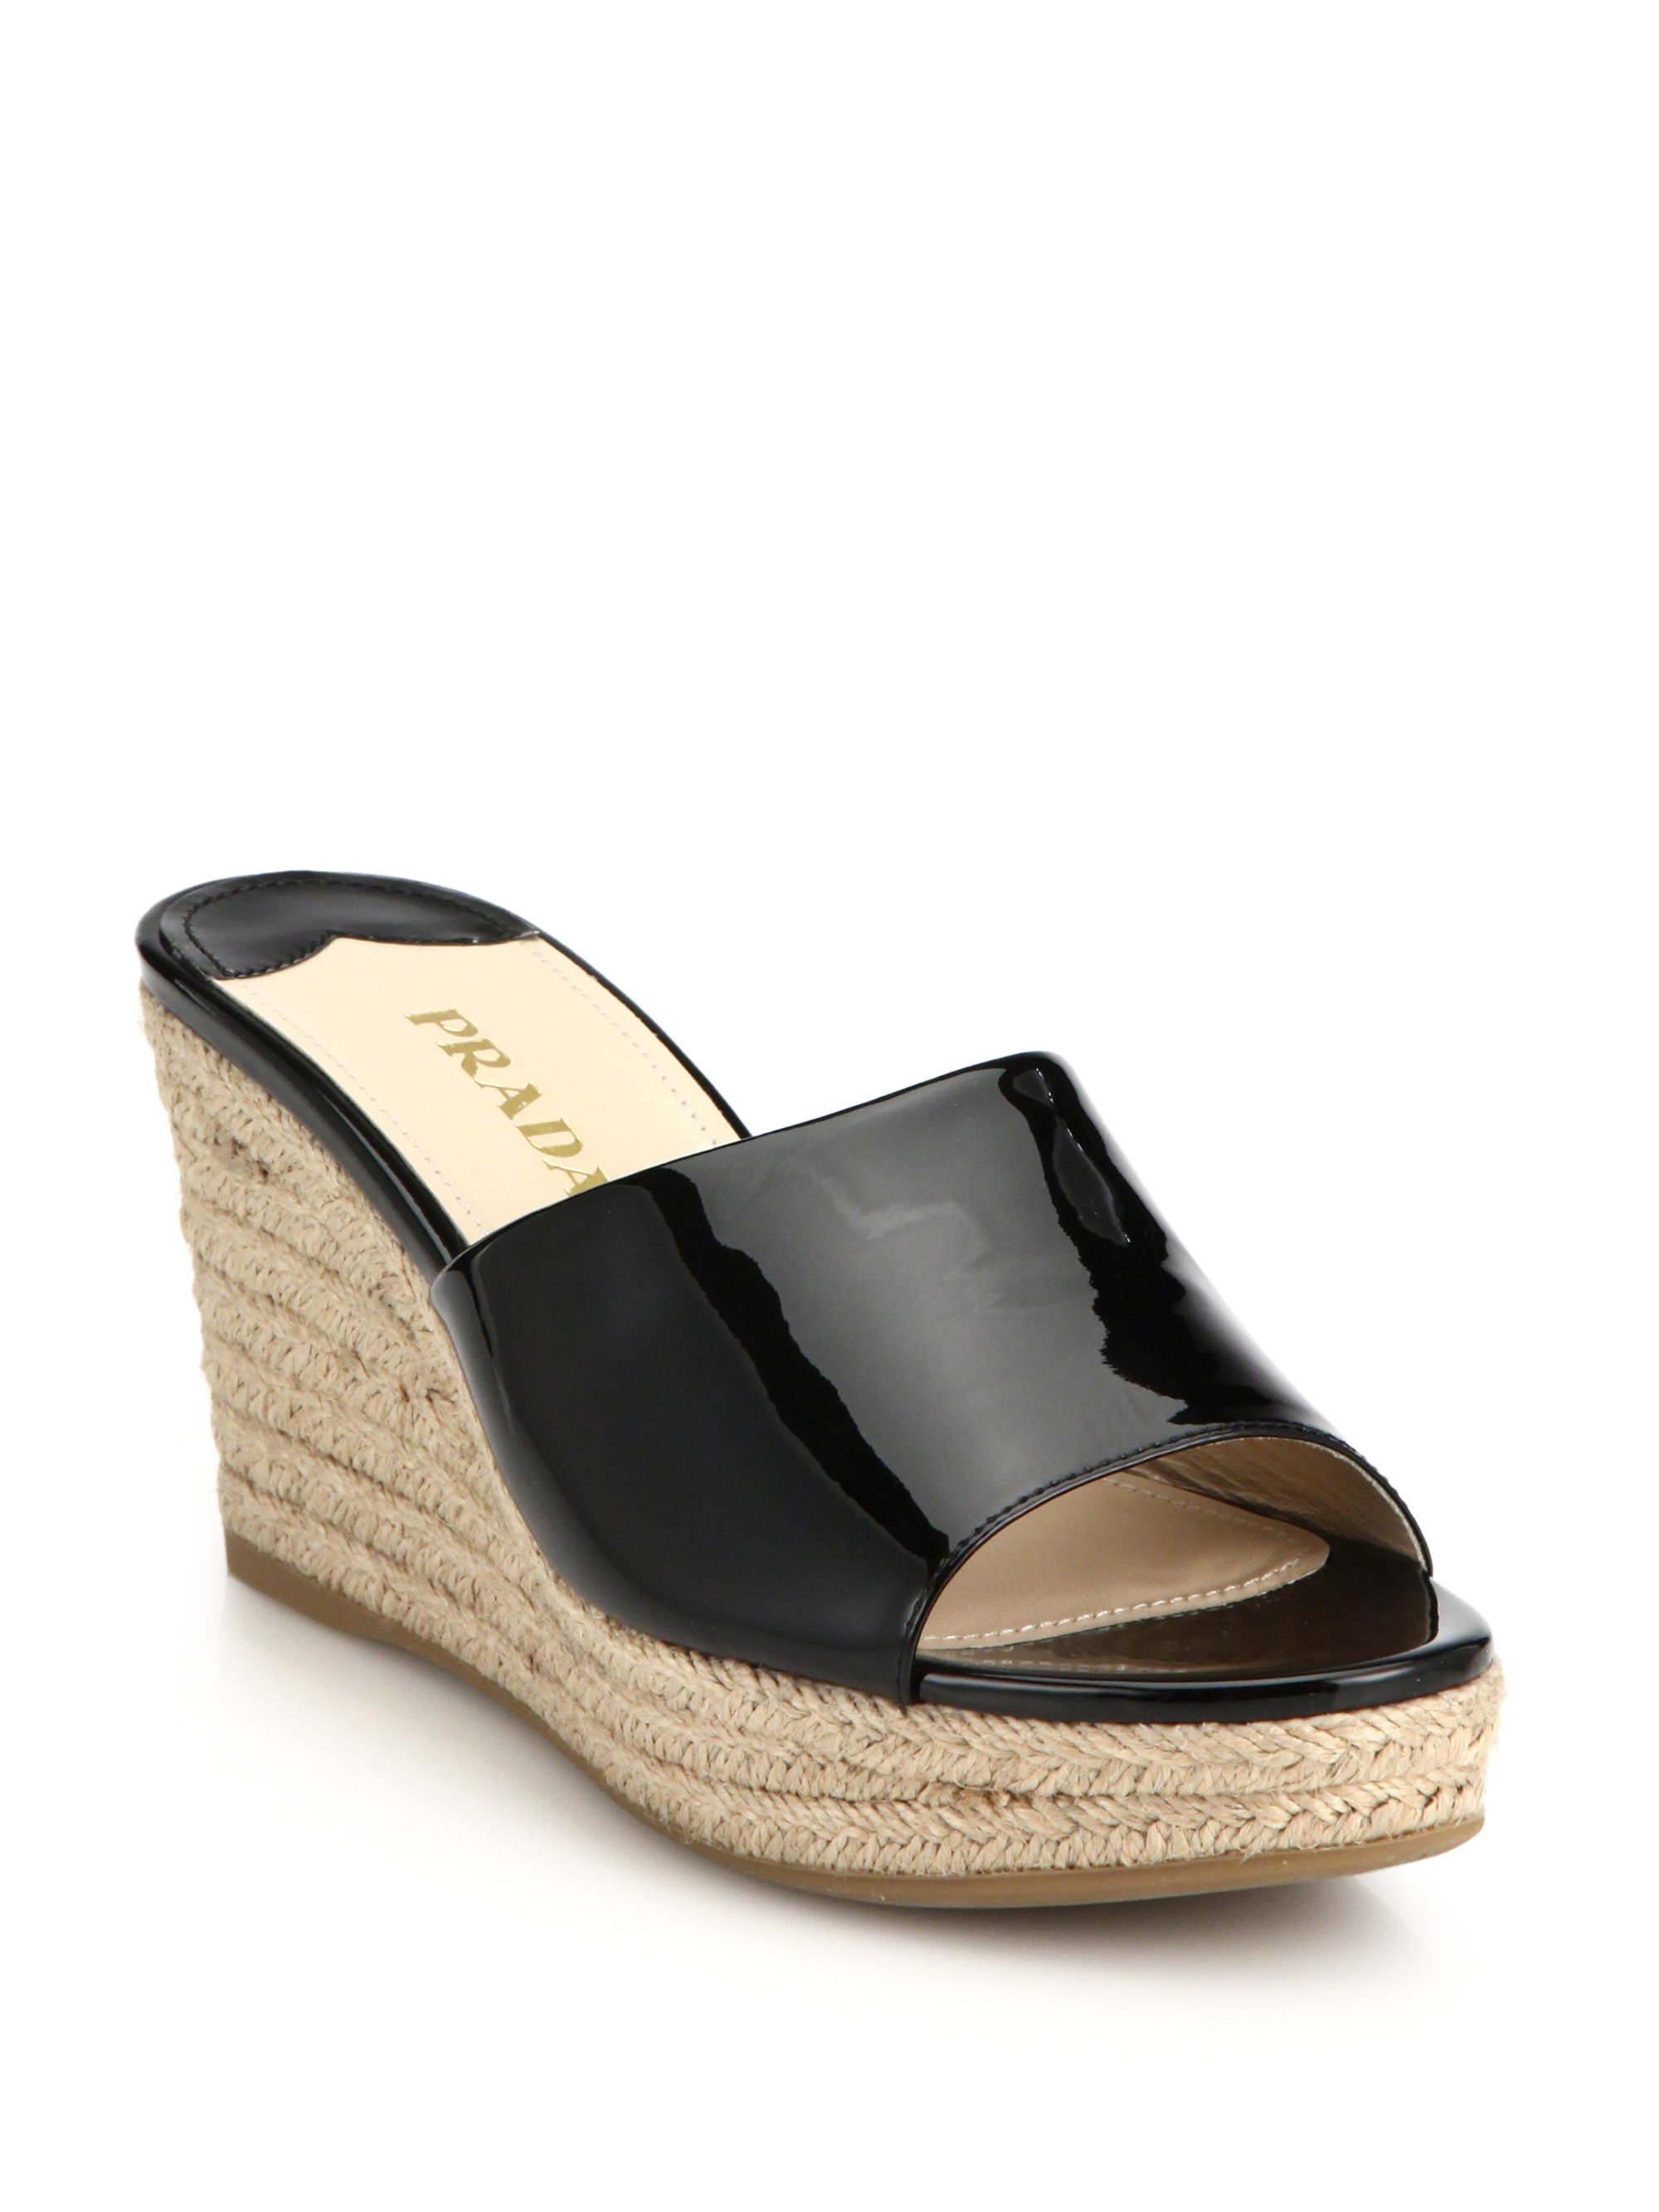 4b6a96d2ae6 Prada Black Patent Leather Wedge Sandals